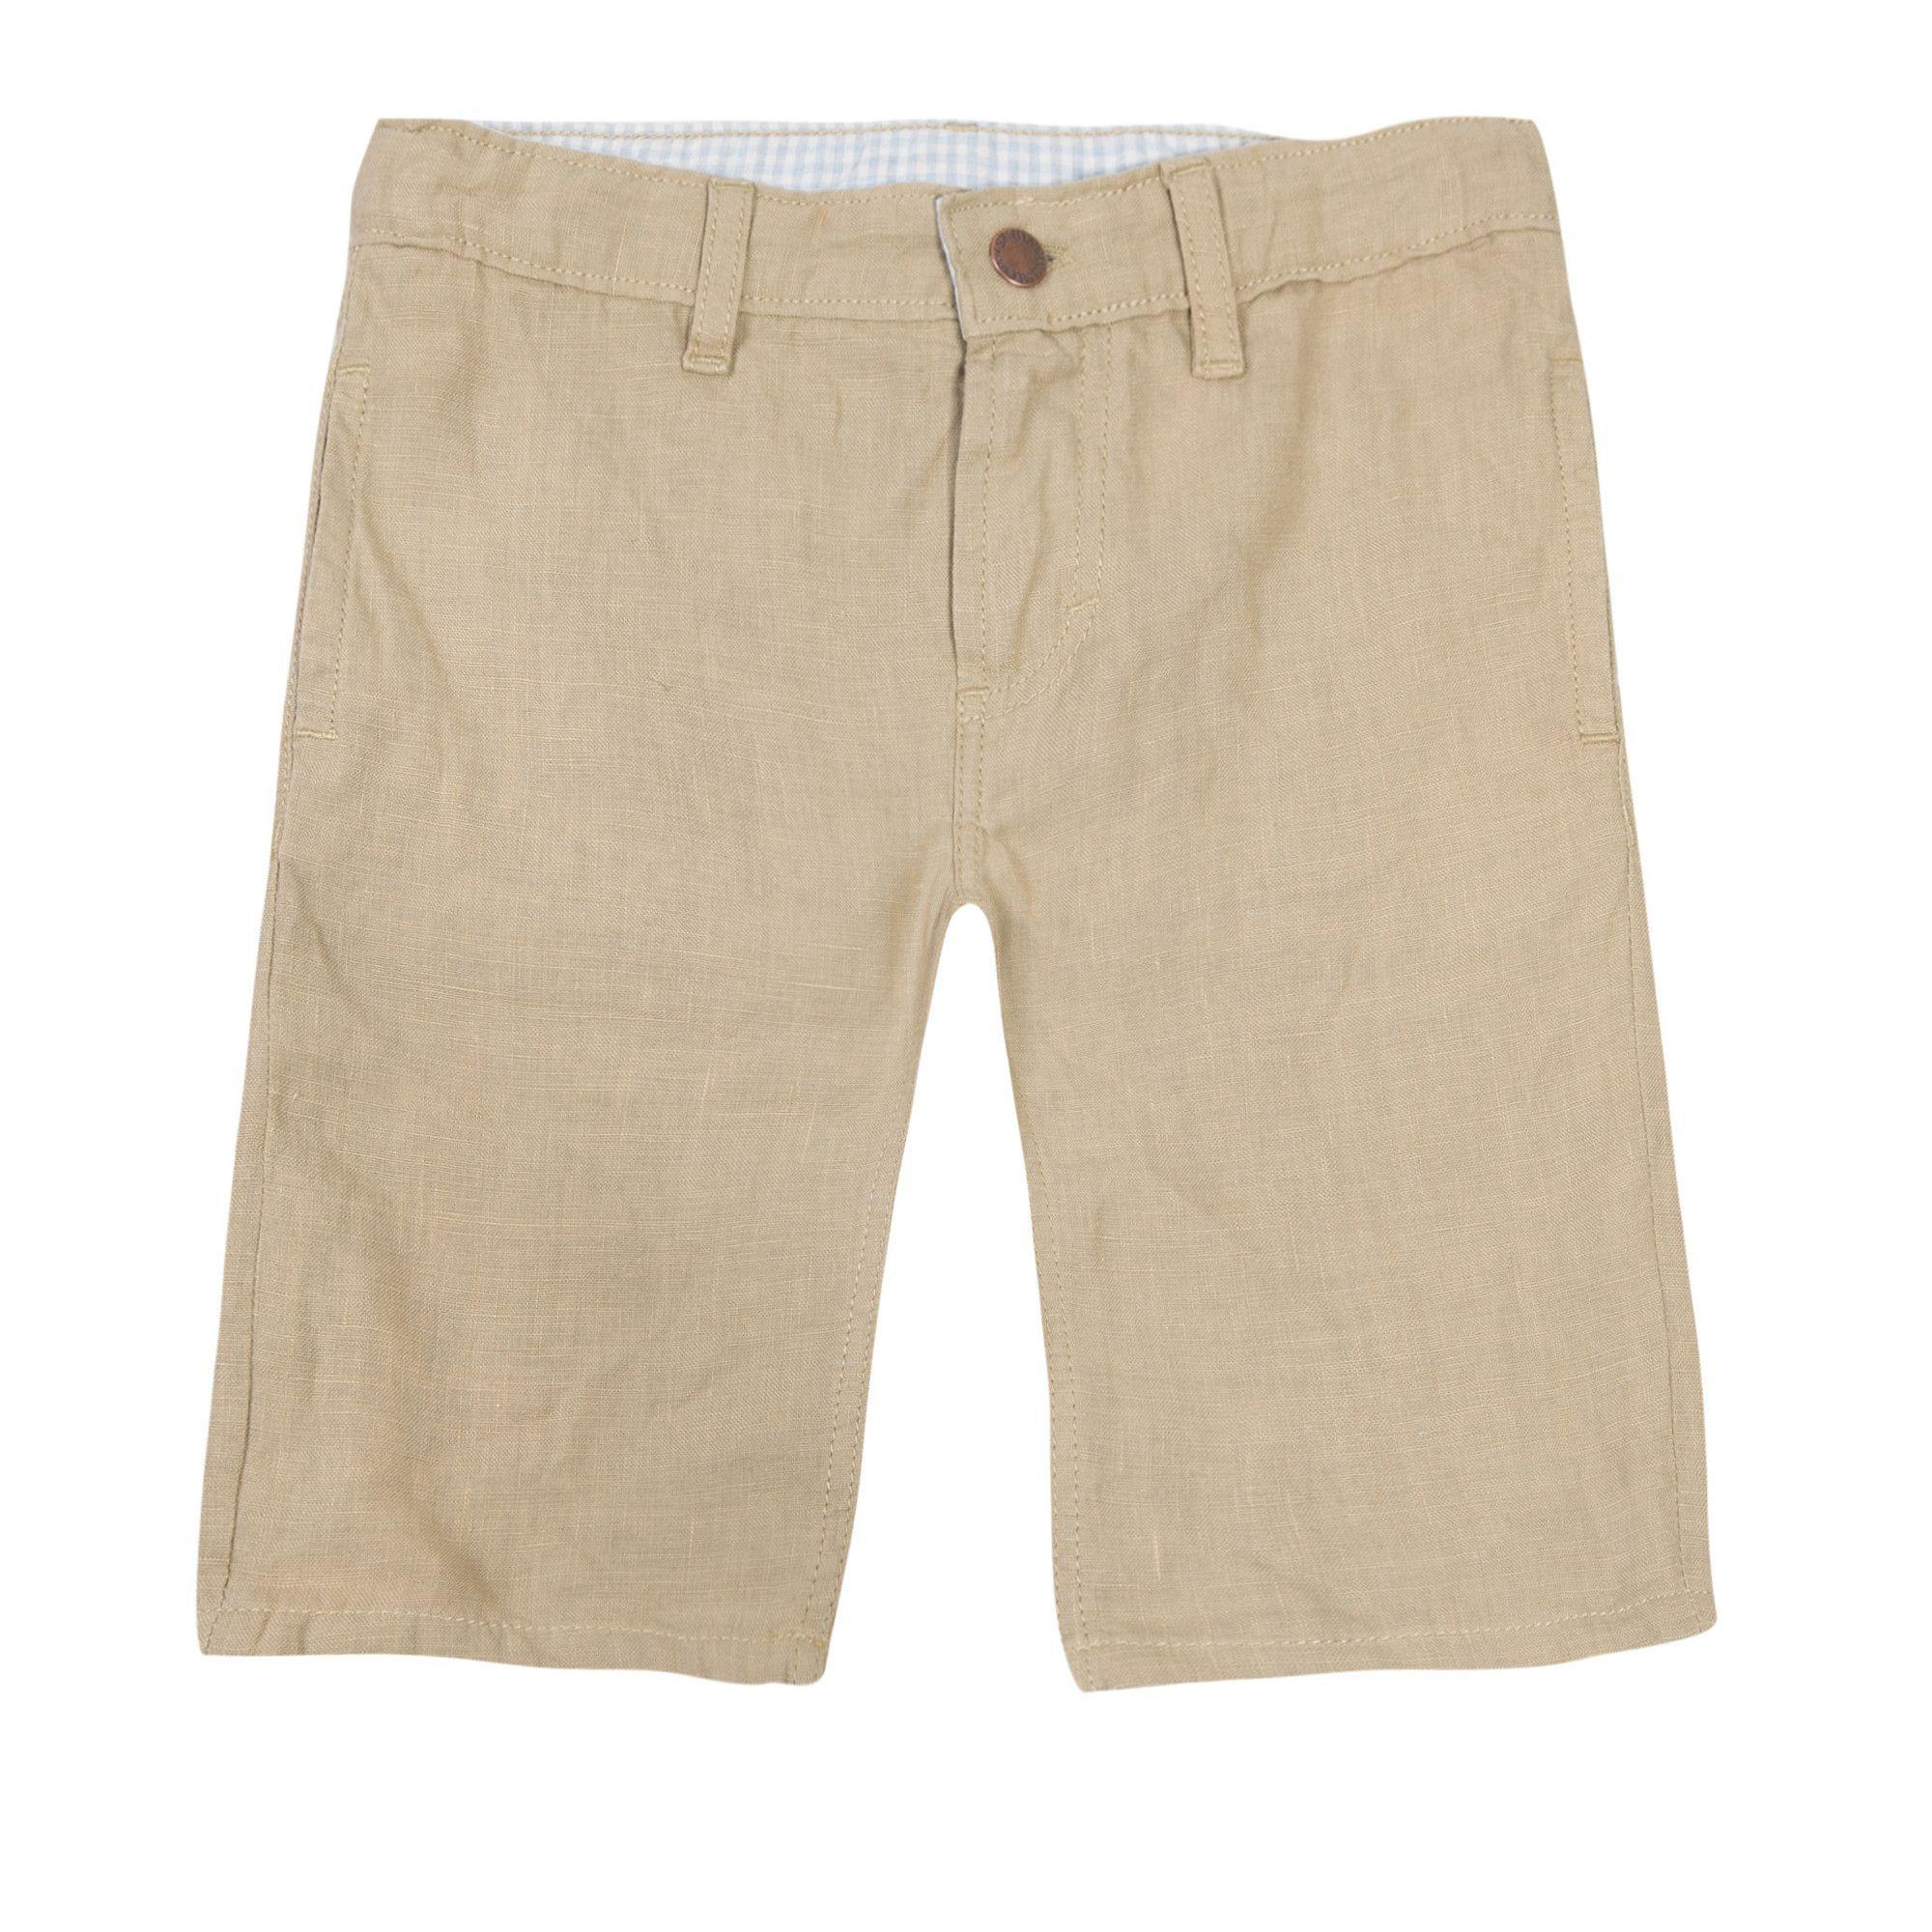 sale retailer cae75 efff1 Dindon Bermuda Shorts | clothing | Asics shoes, Adidas, Air ...